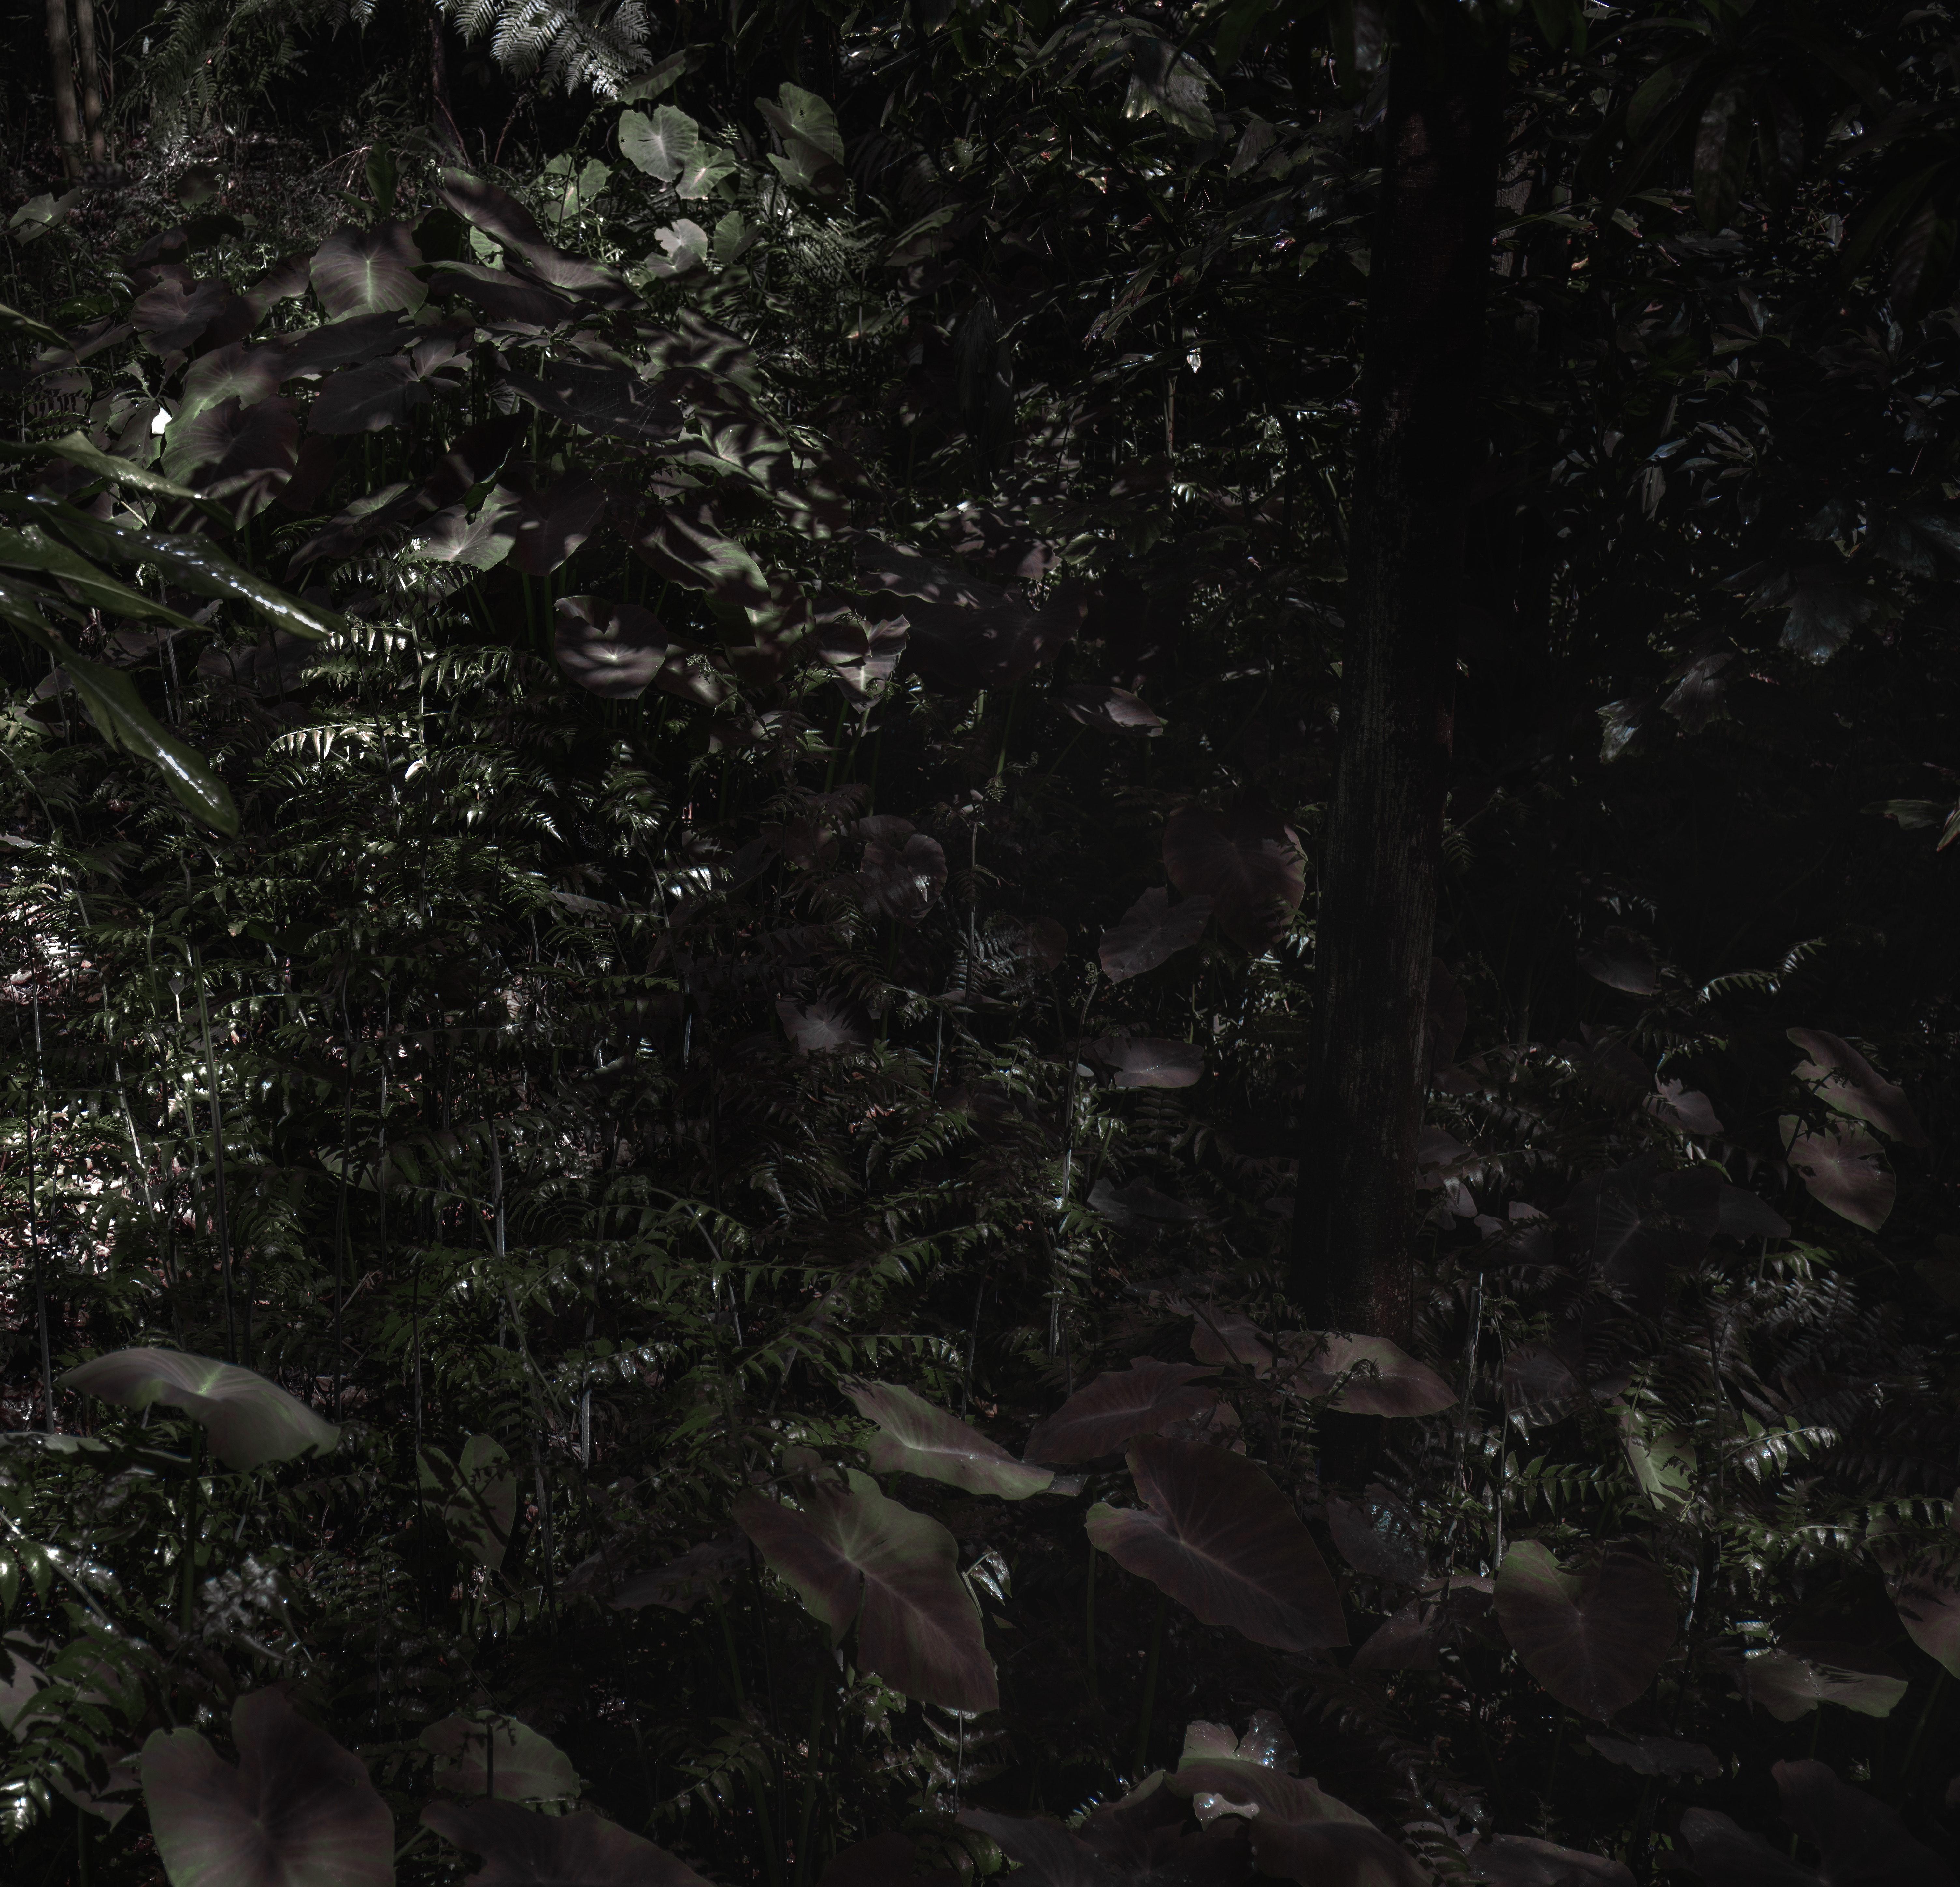 prickly ferns